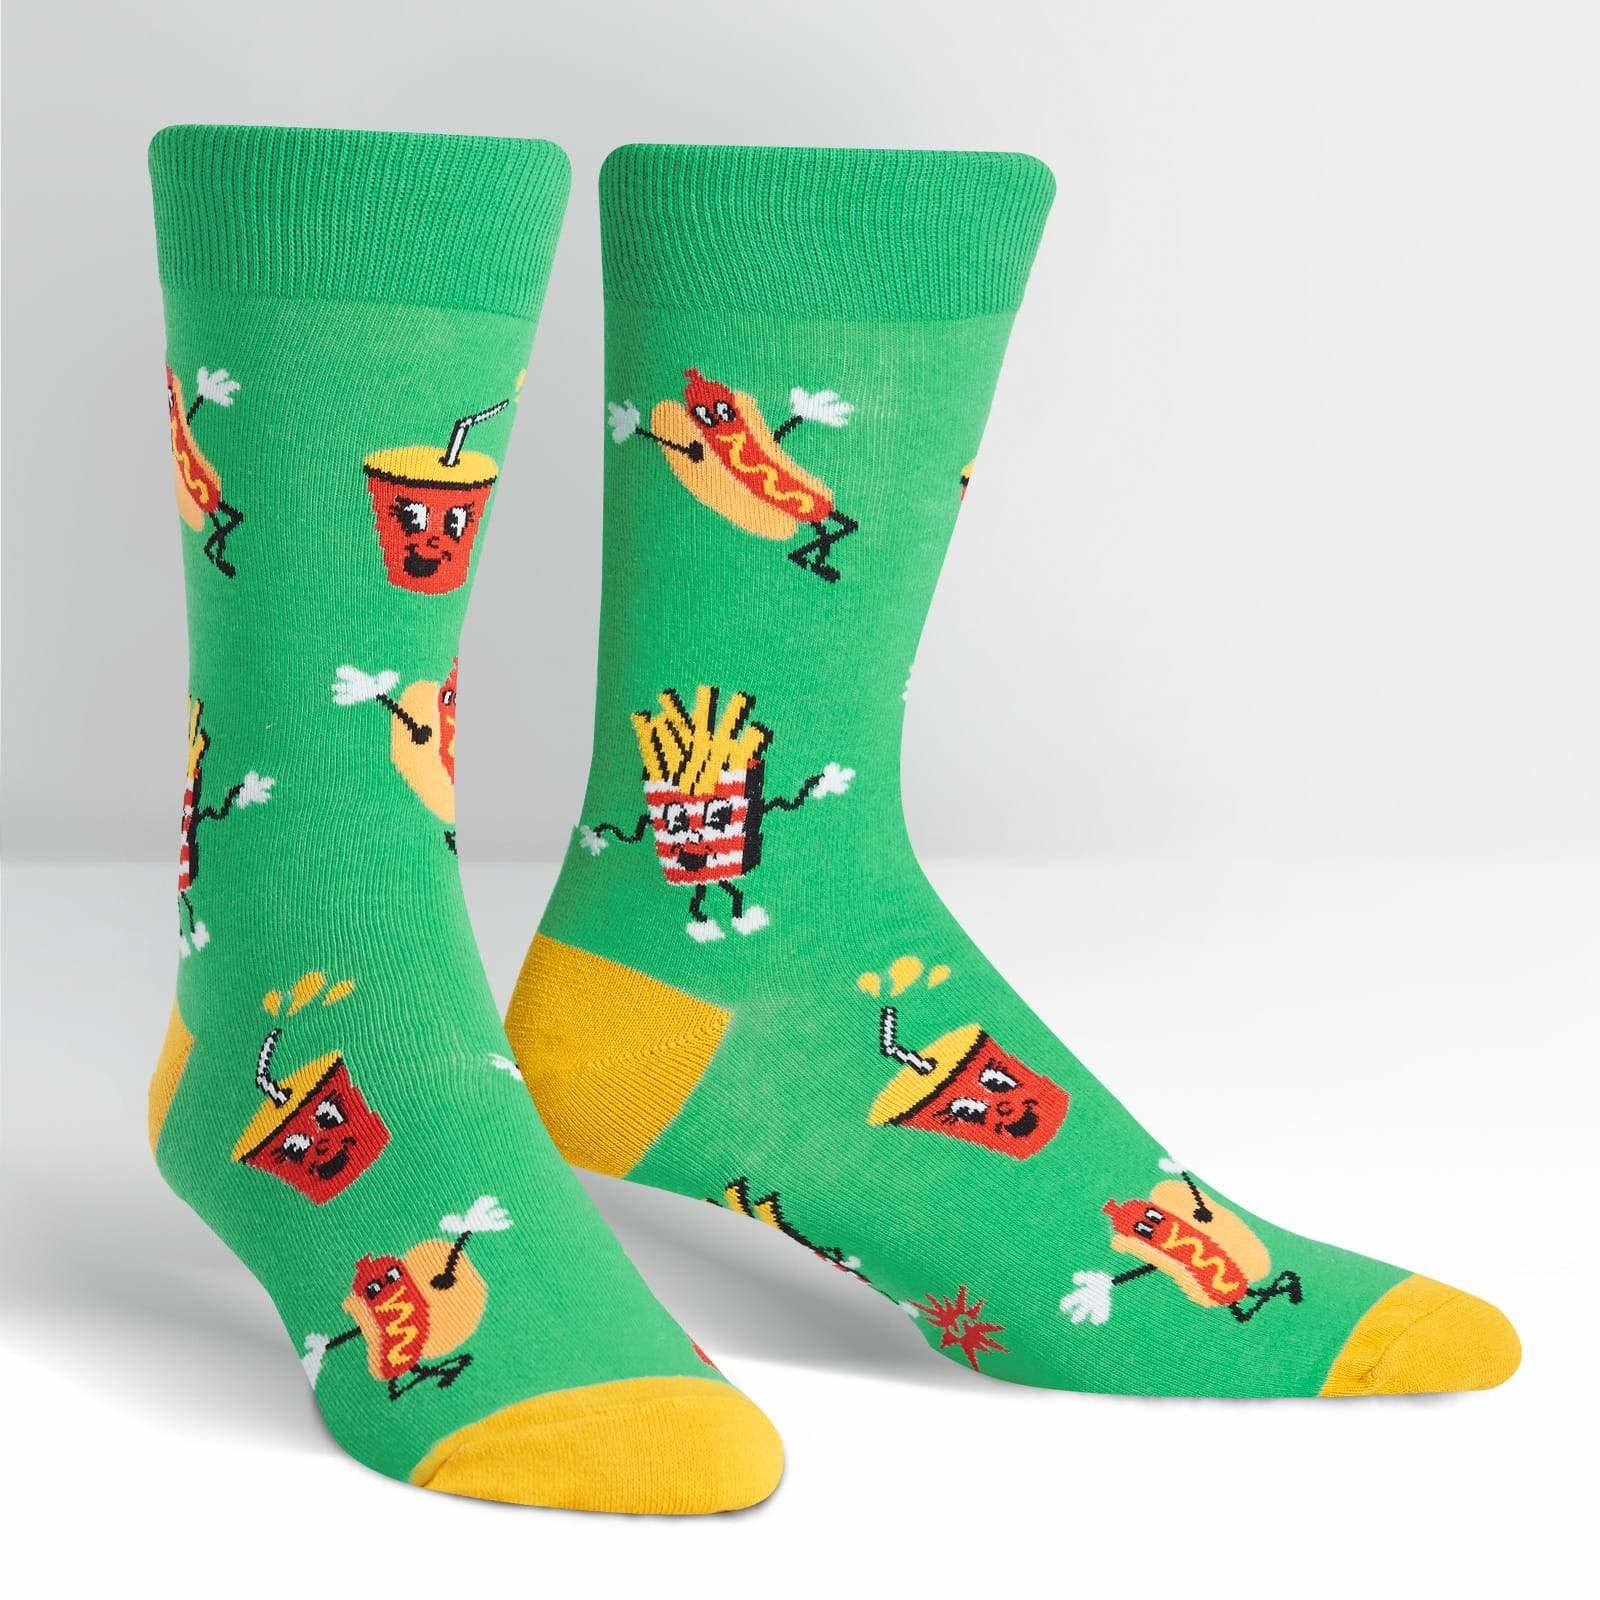 Intermission Crew Socks